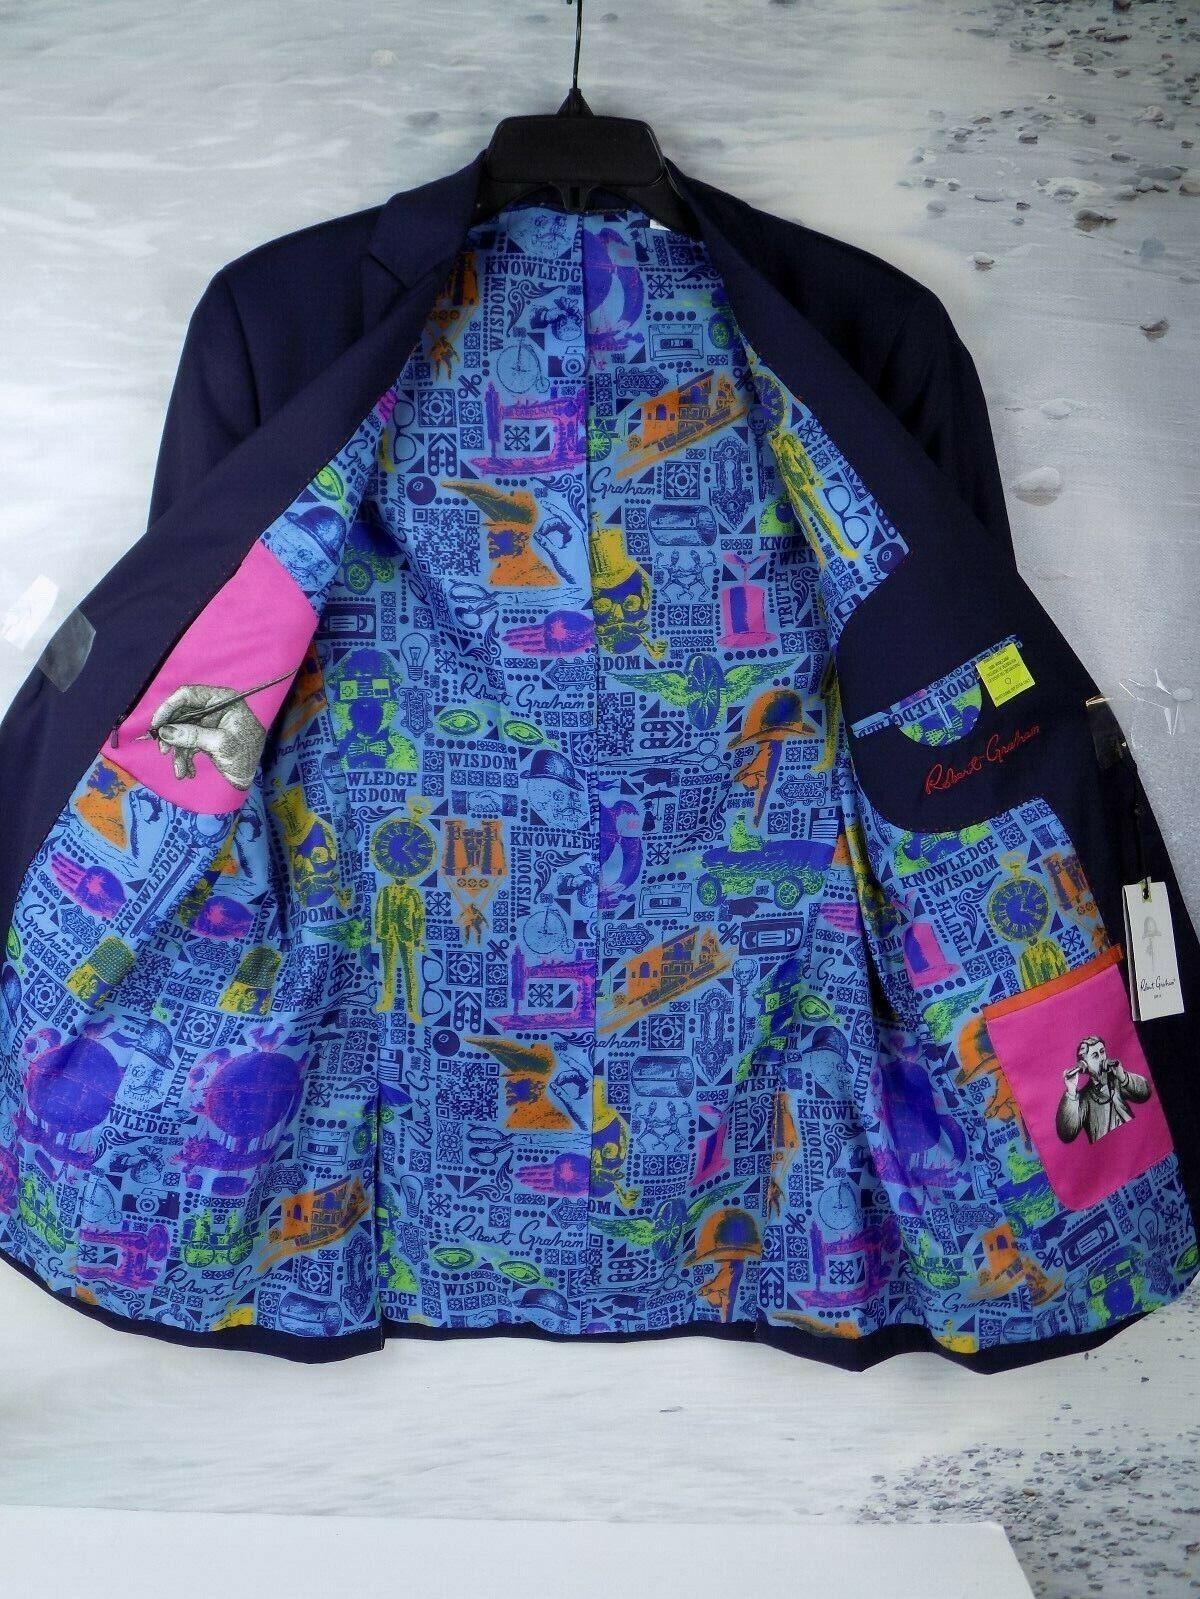 598 NWT Robert Graham Cicero Basic wolleSport coat Navy männer's Größe-36